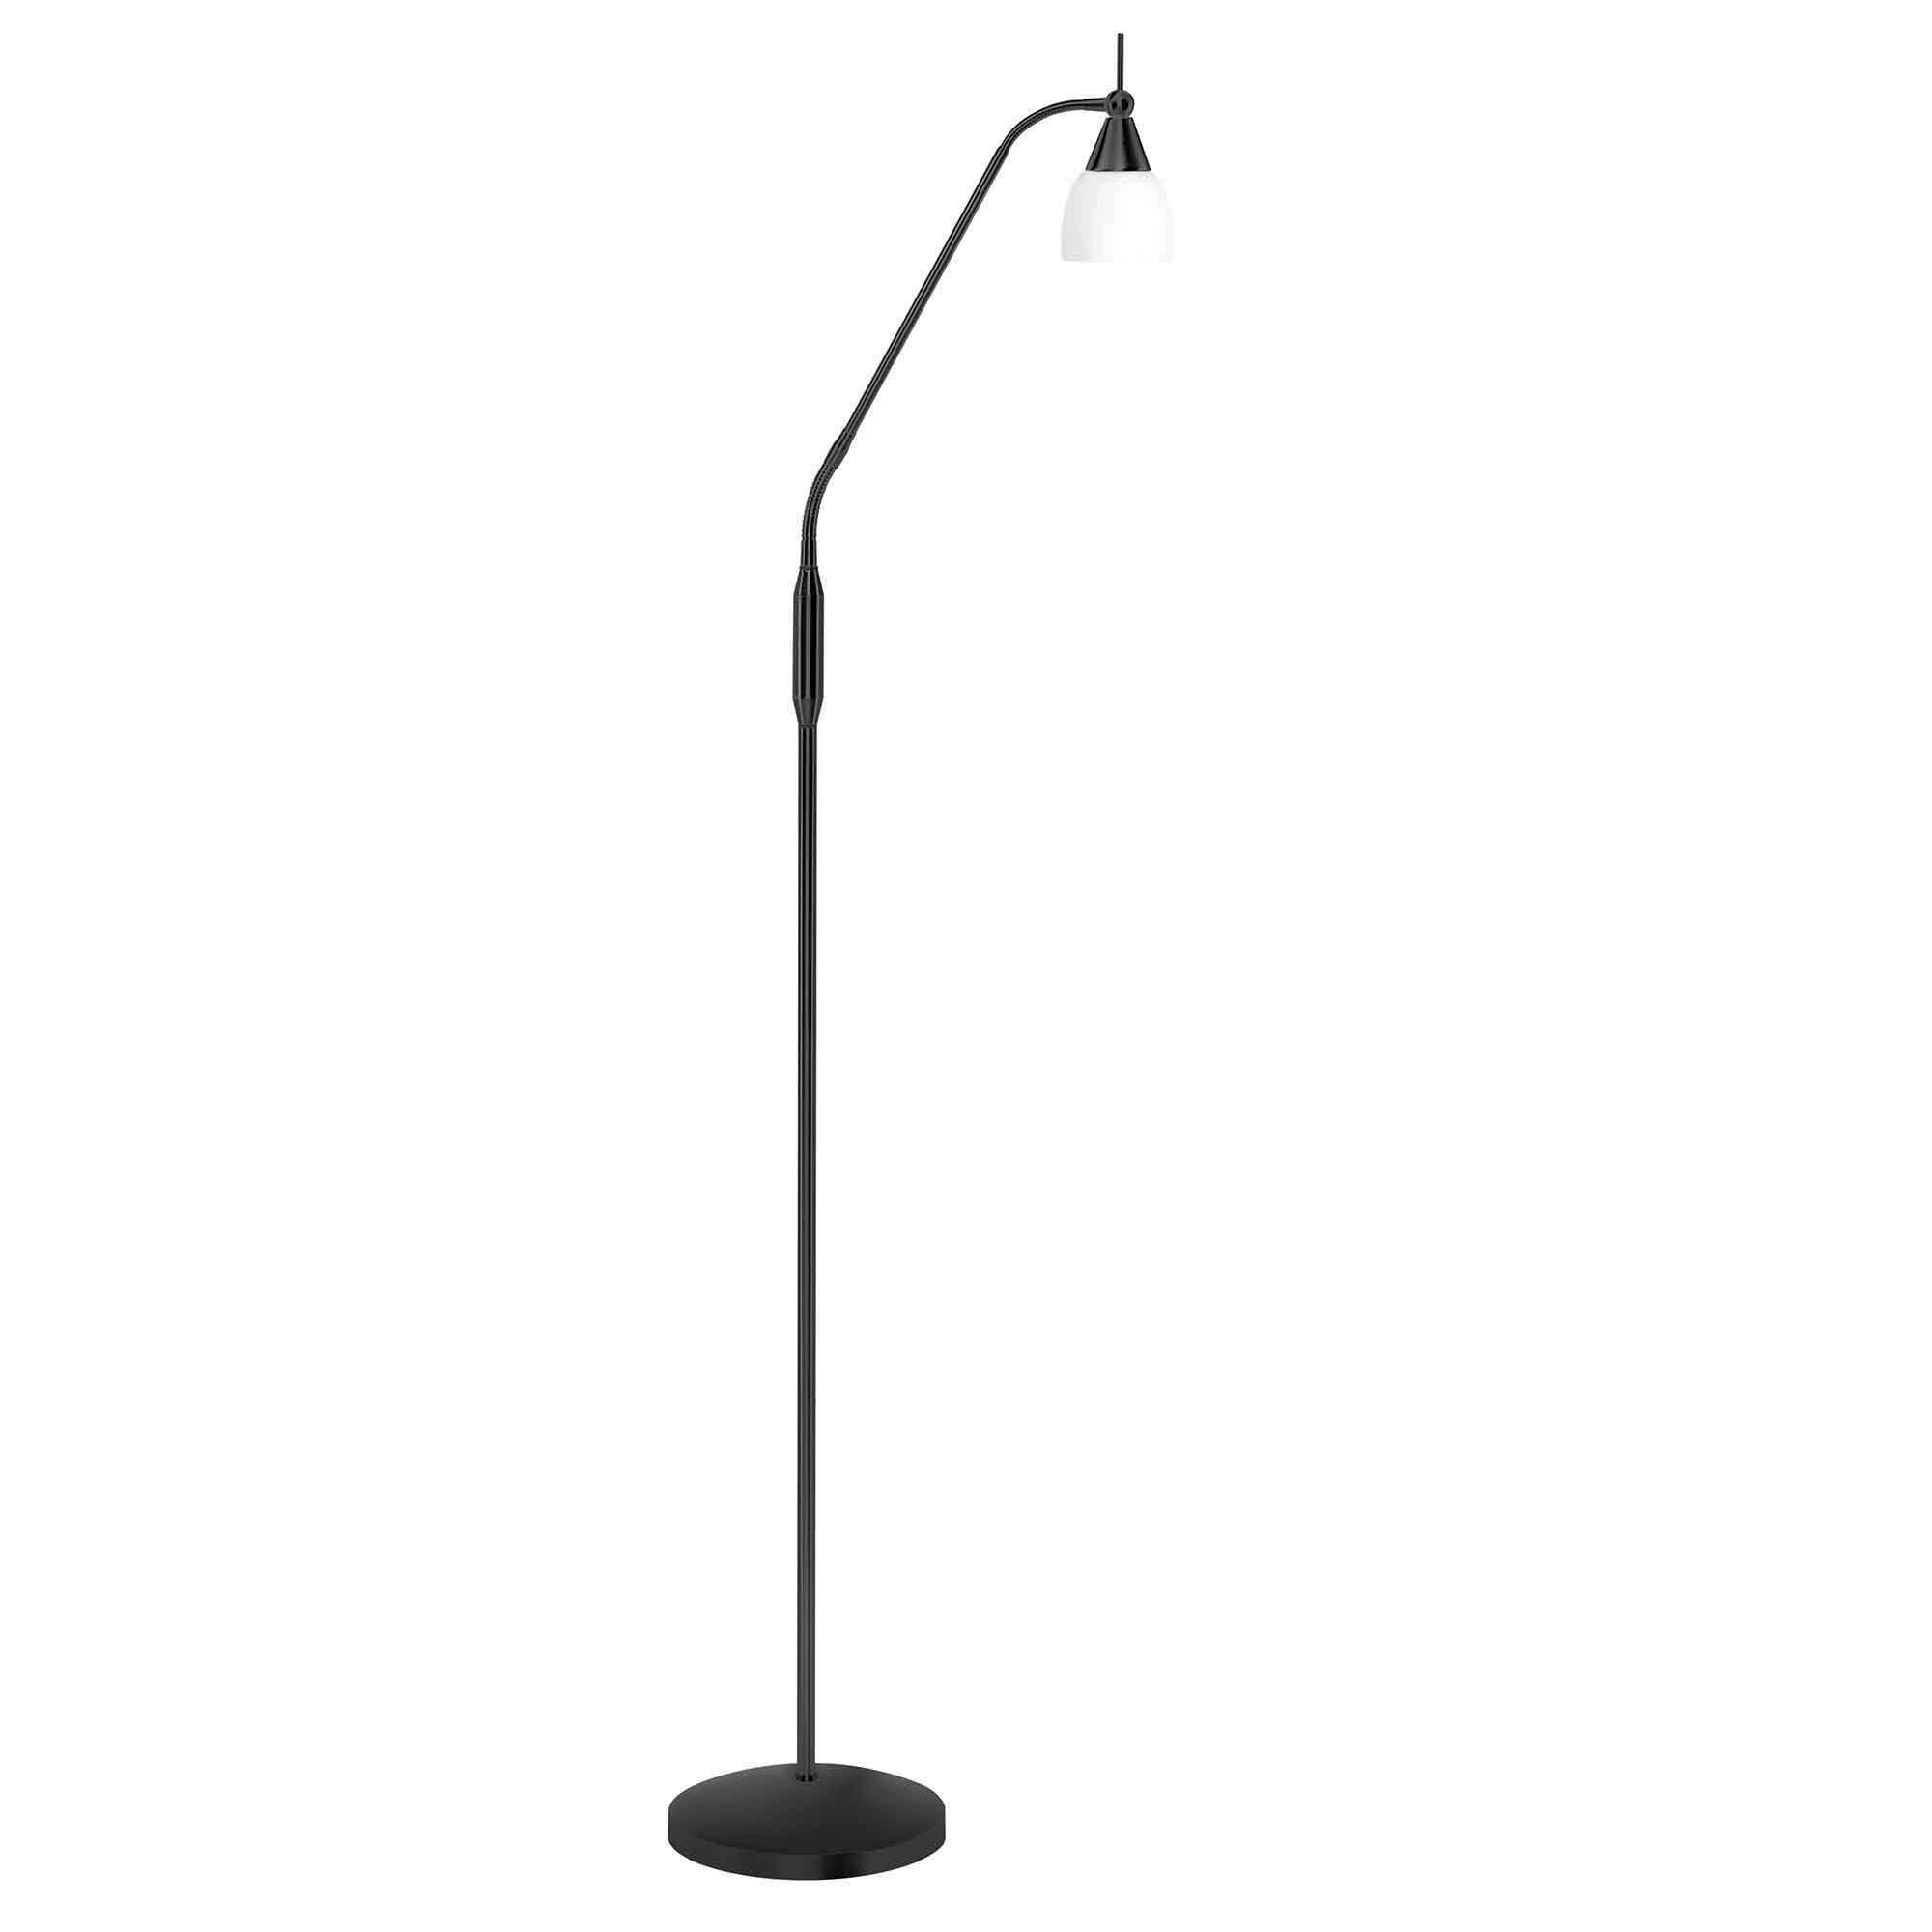 Highlight Vloerlamp Touchy glas H 145 cm zwart